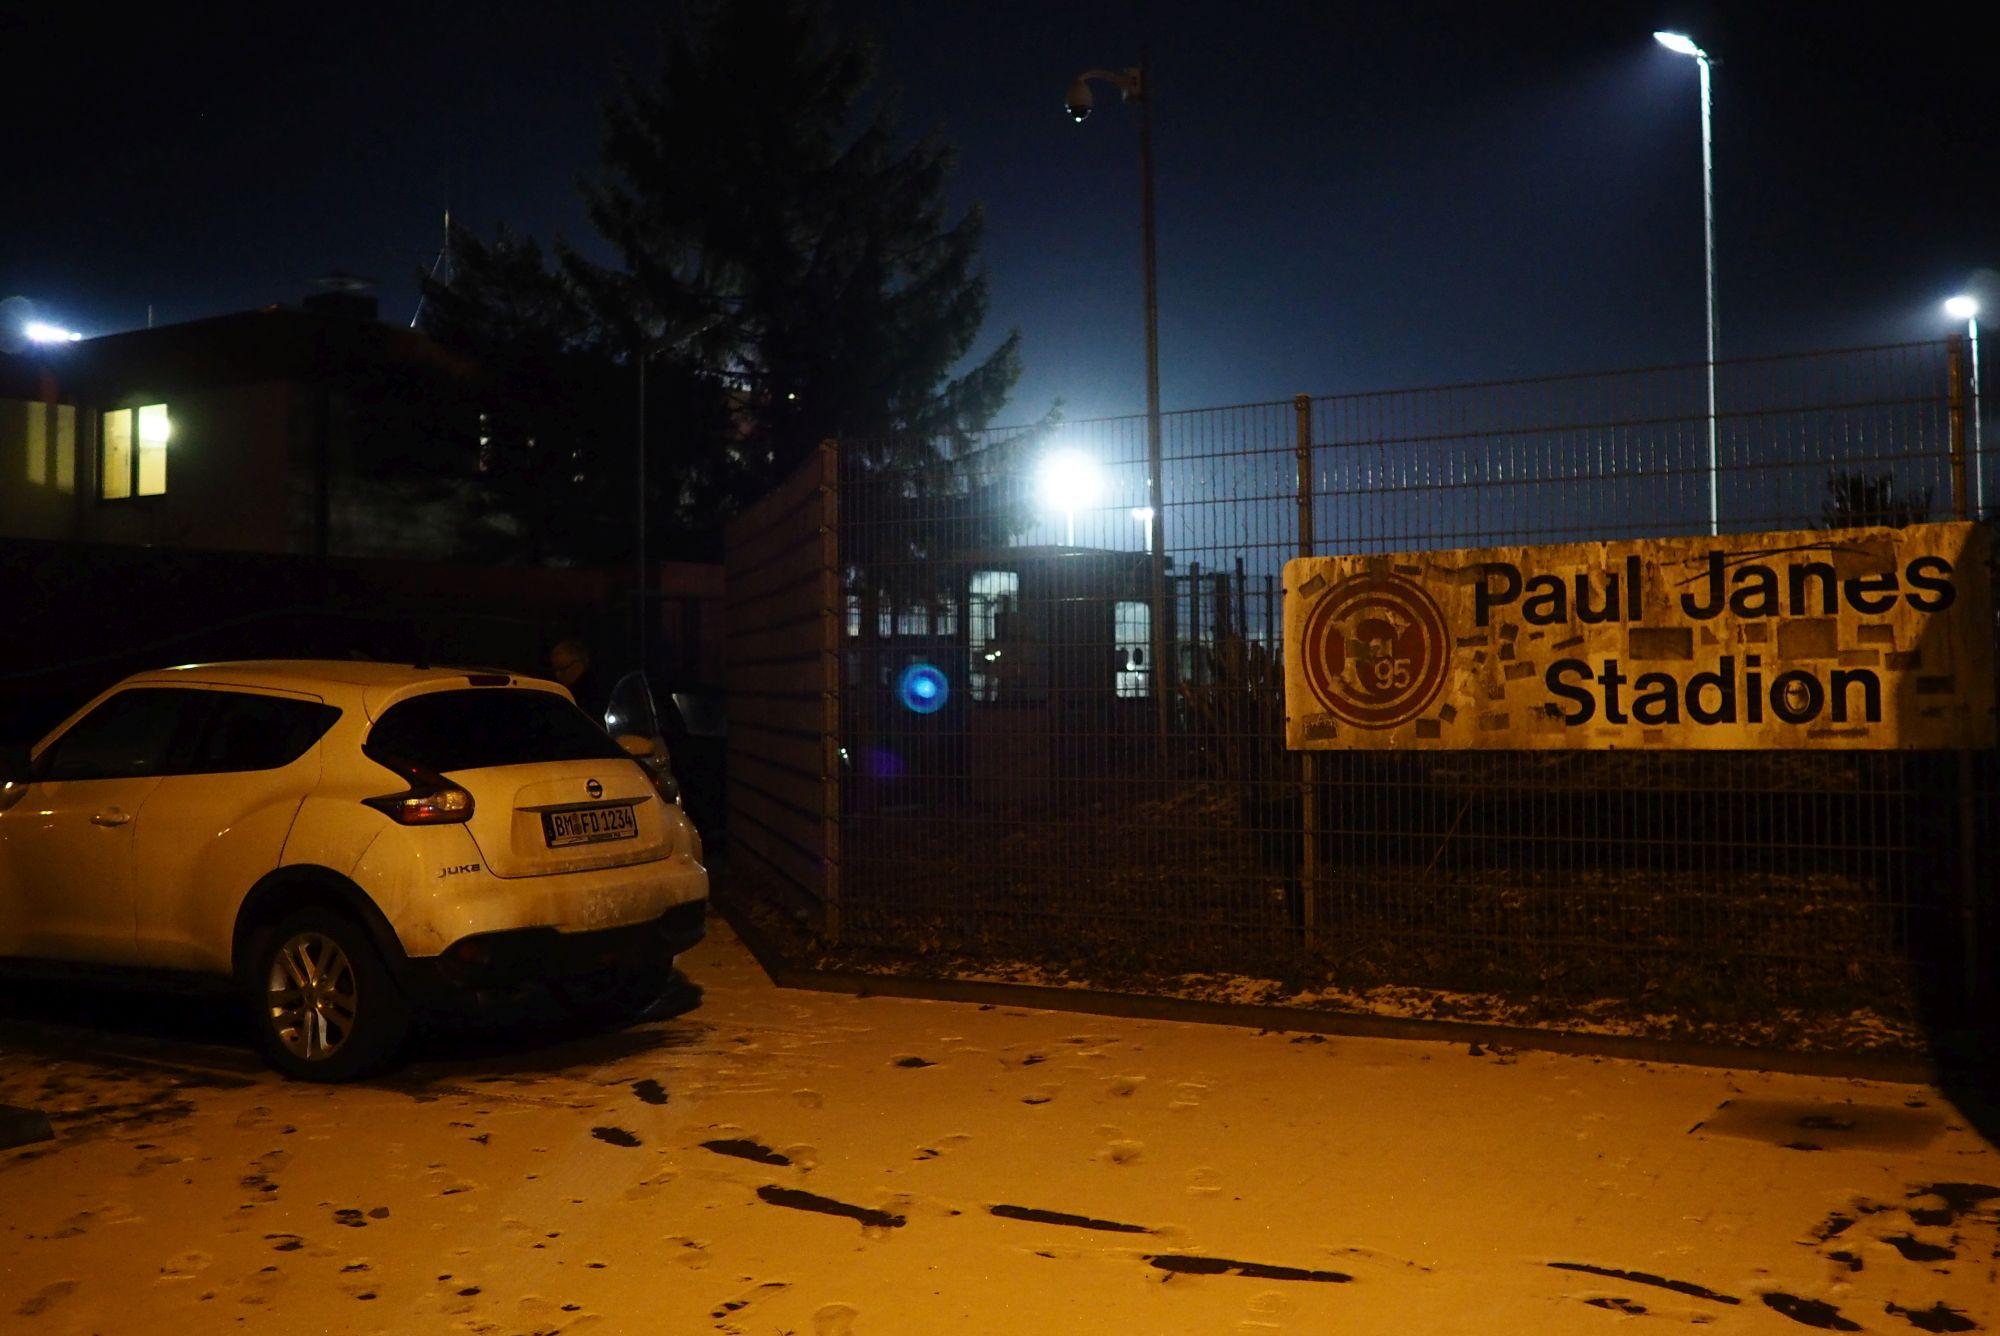 Das legendäre Paul-Janes-Stadion am Flinger Broich